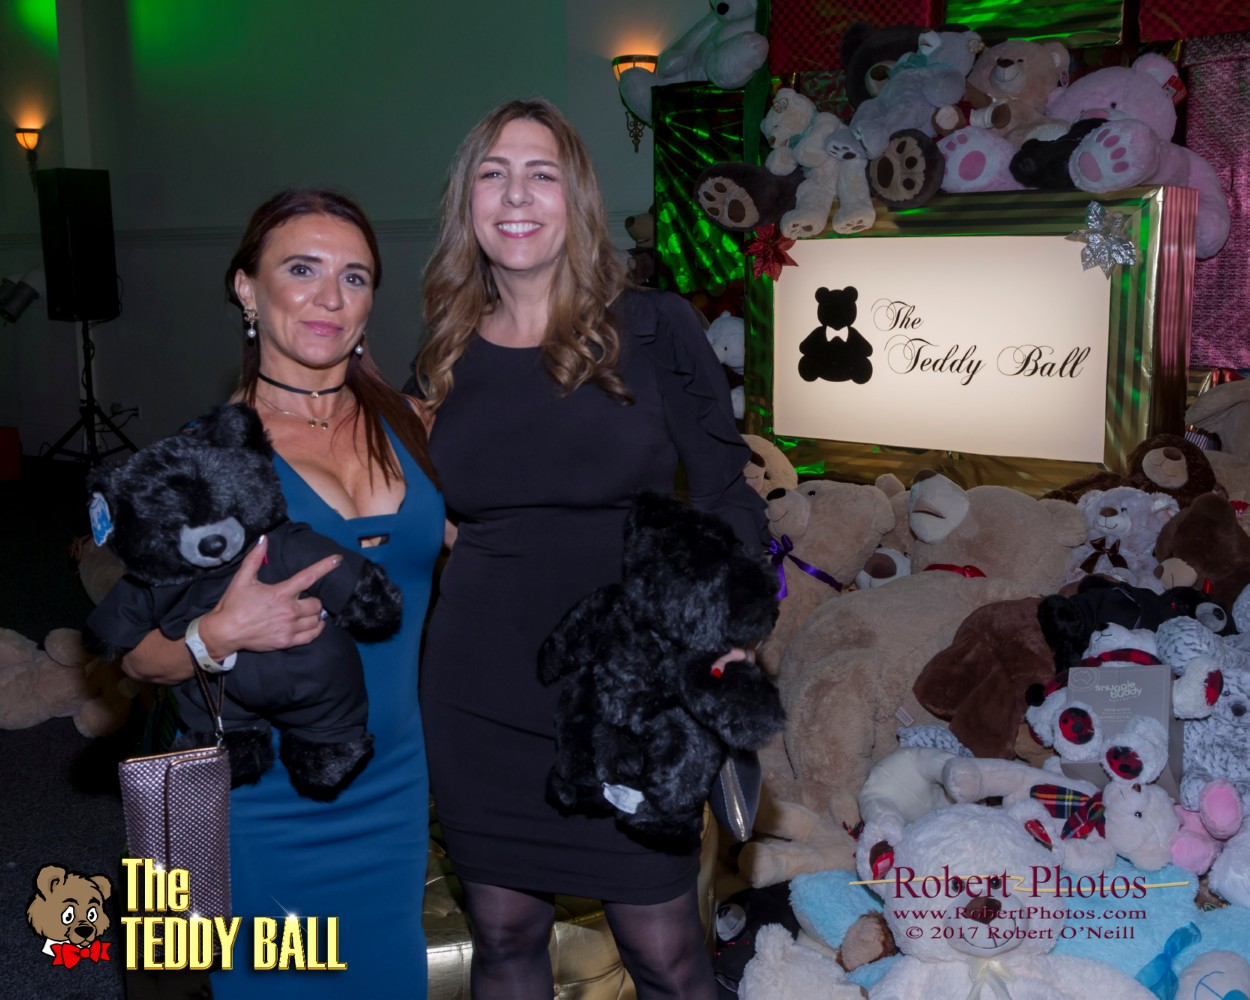 Teddy-Ball-2017-Robert-Photos- 33.jpg